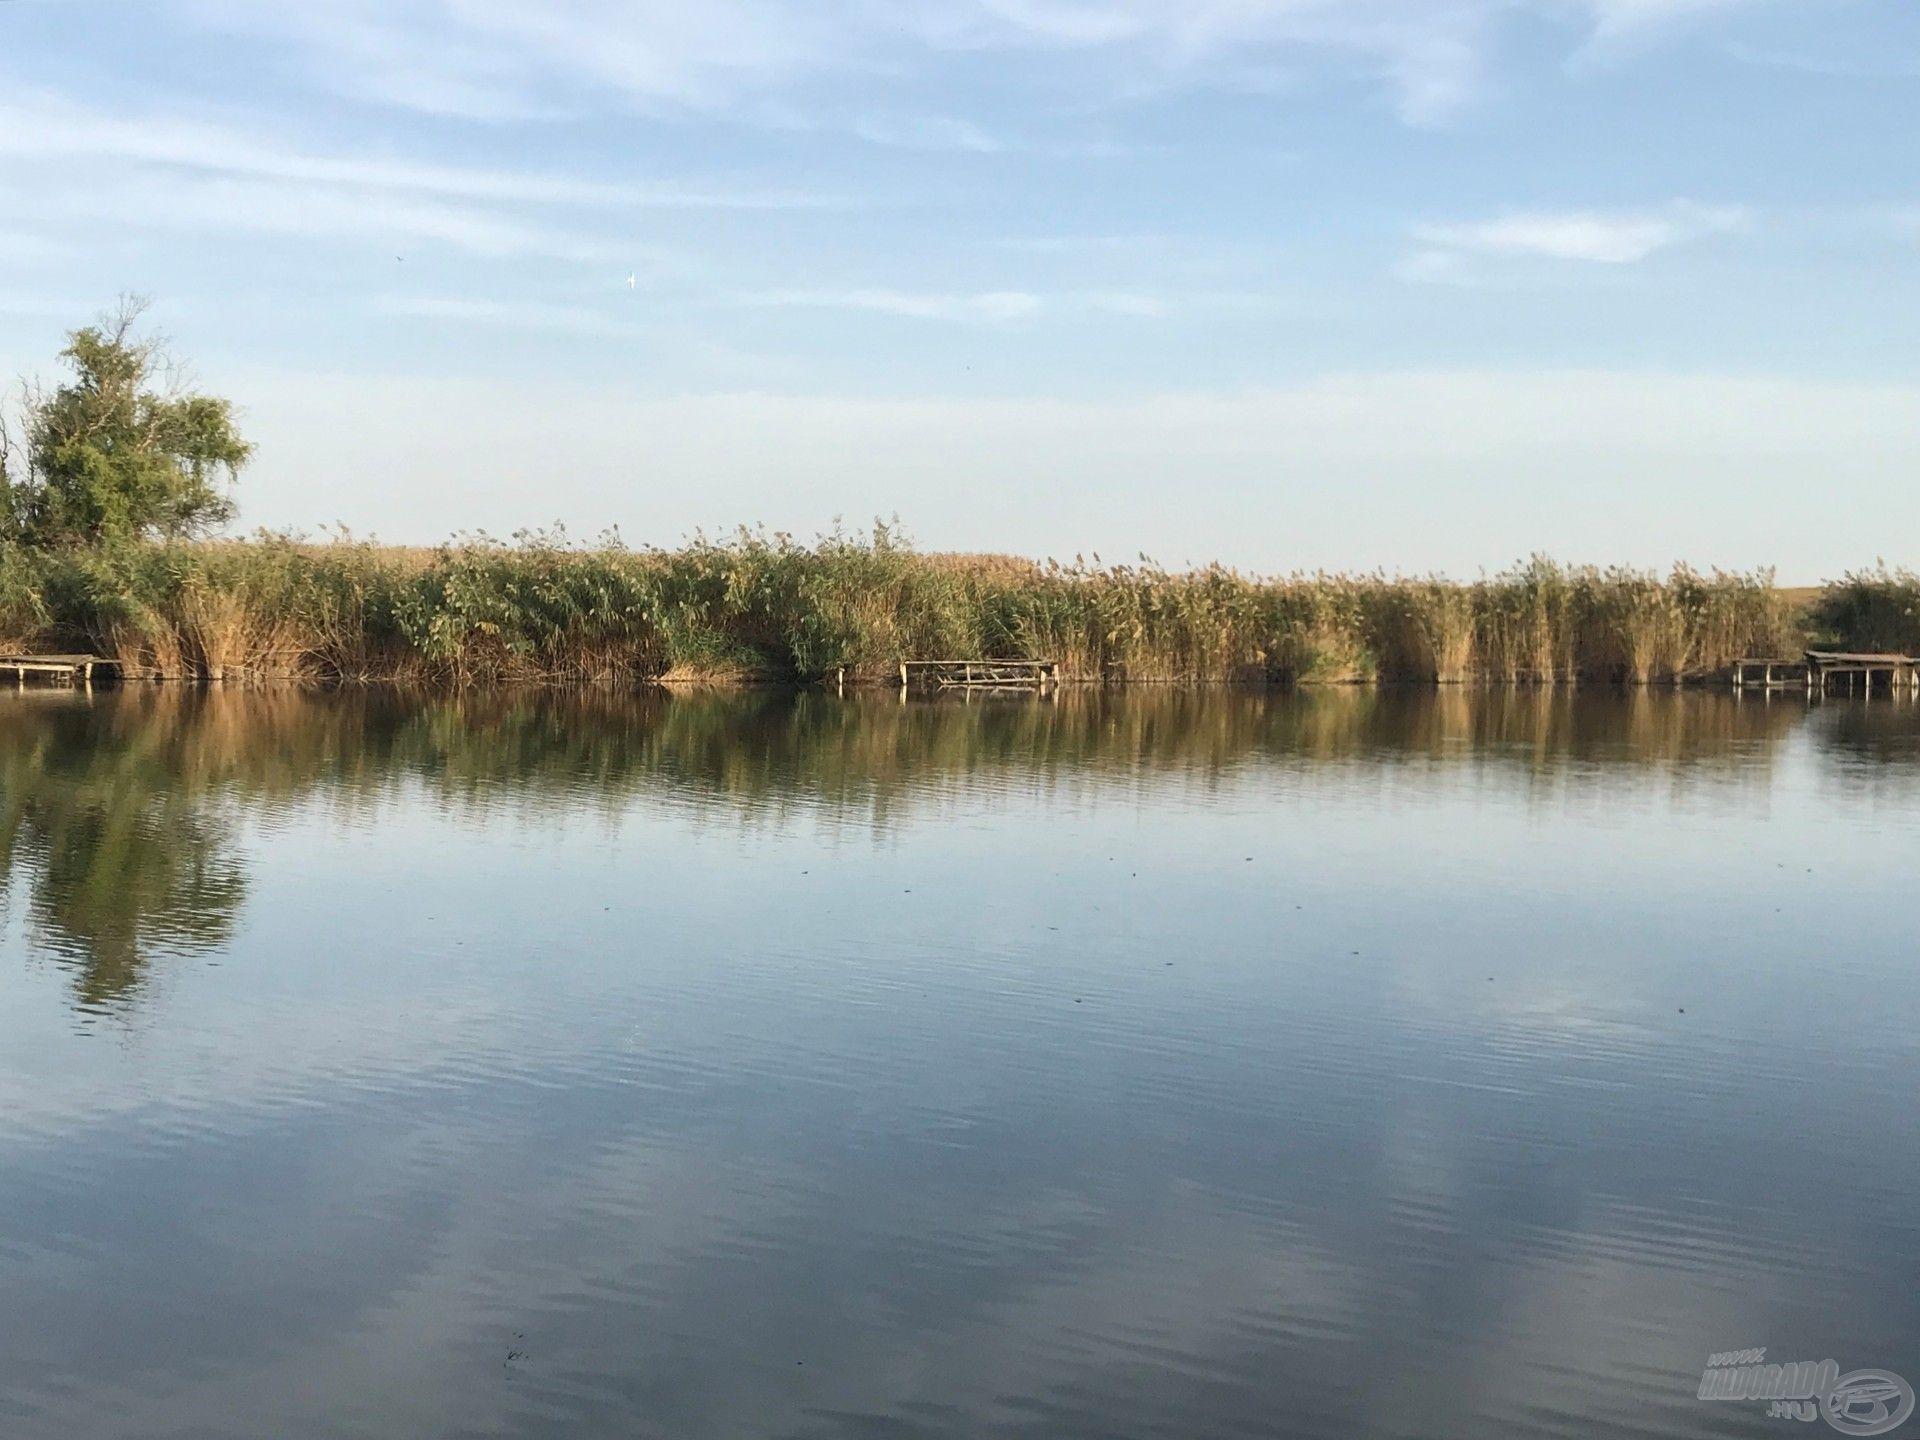 A túlparti öreg stég romjai elé horgászom, úgy 50 m-re